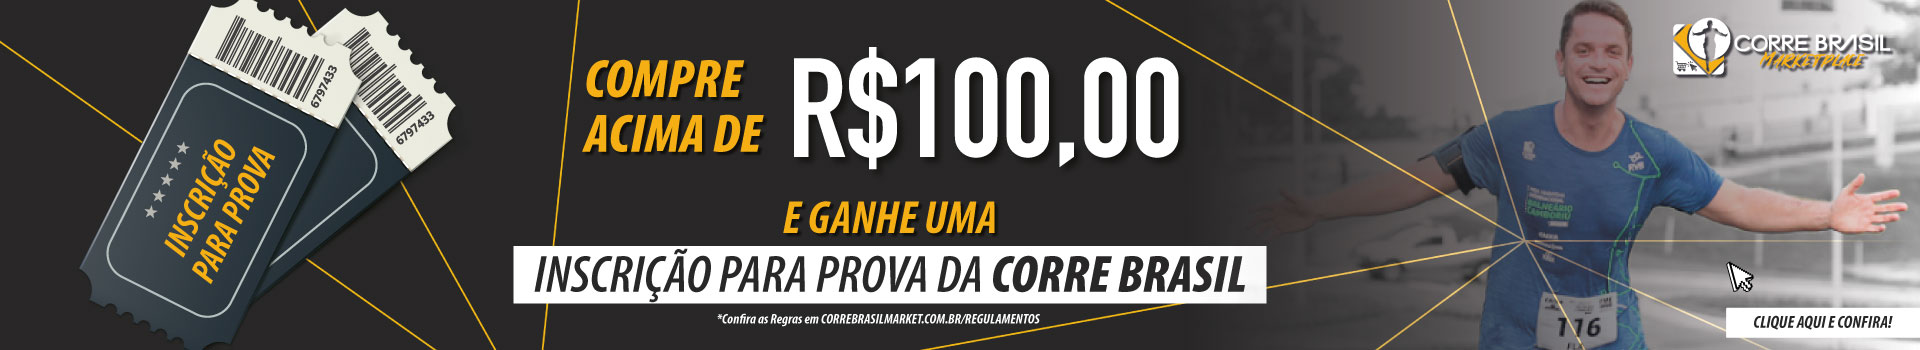 Corre Brasil Marketplace